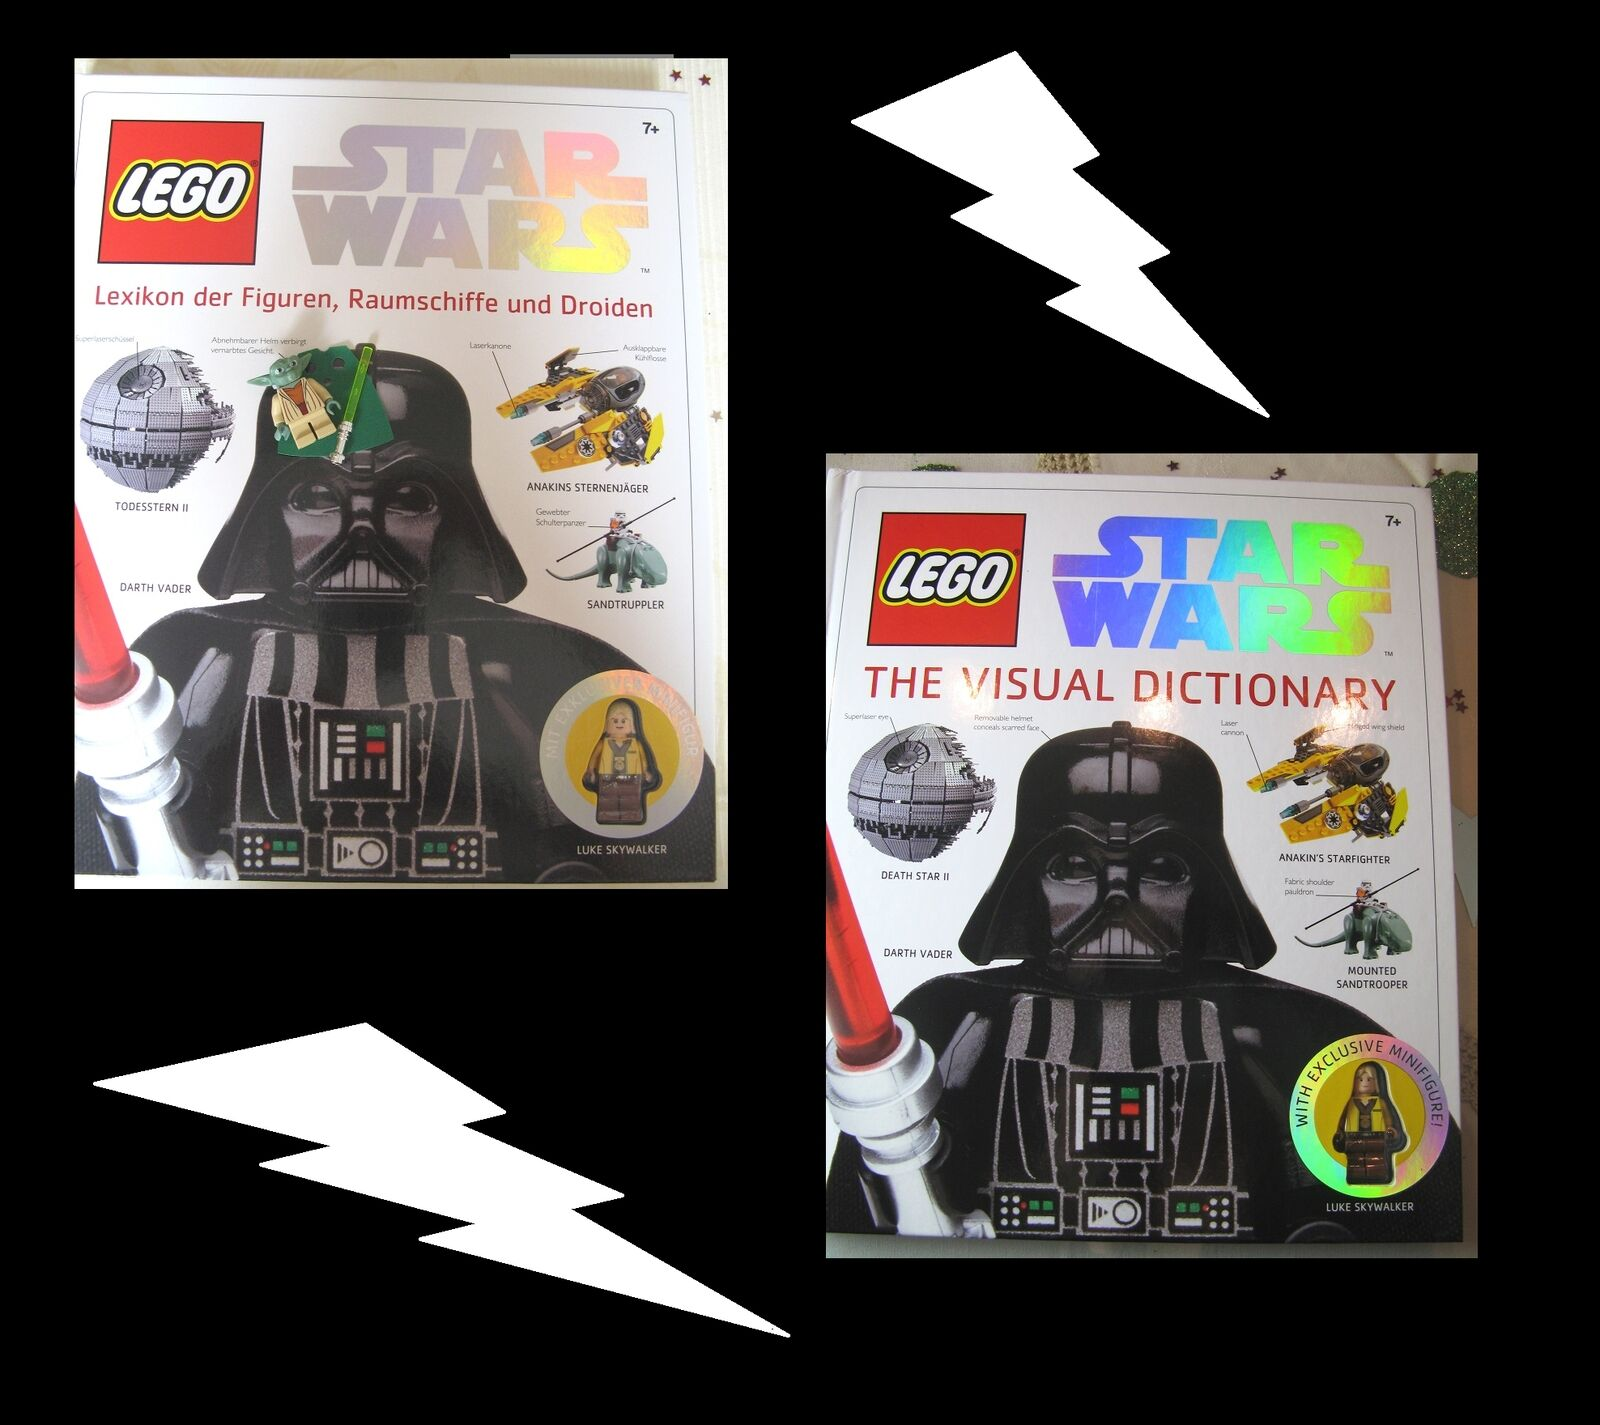 Lego Star Wars Buch Lexikon-The Visual Dictionary u Figur Yoda o. Count Dooku